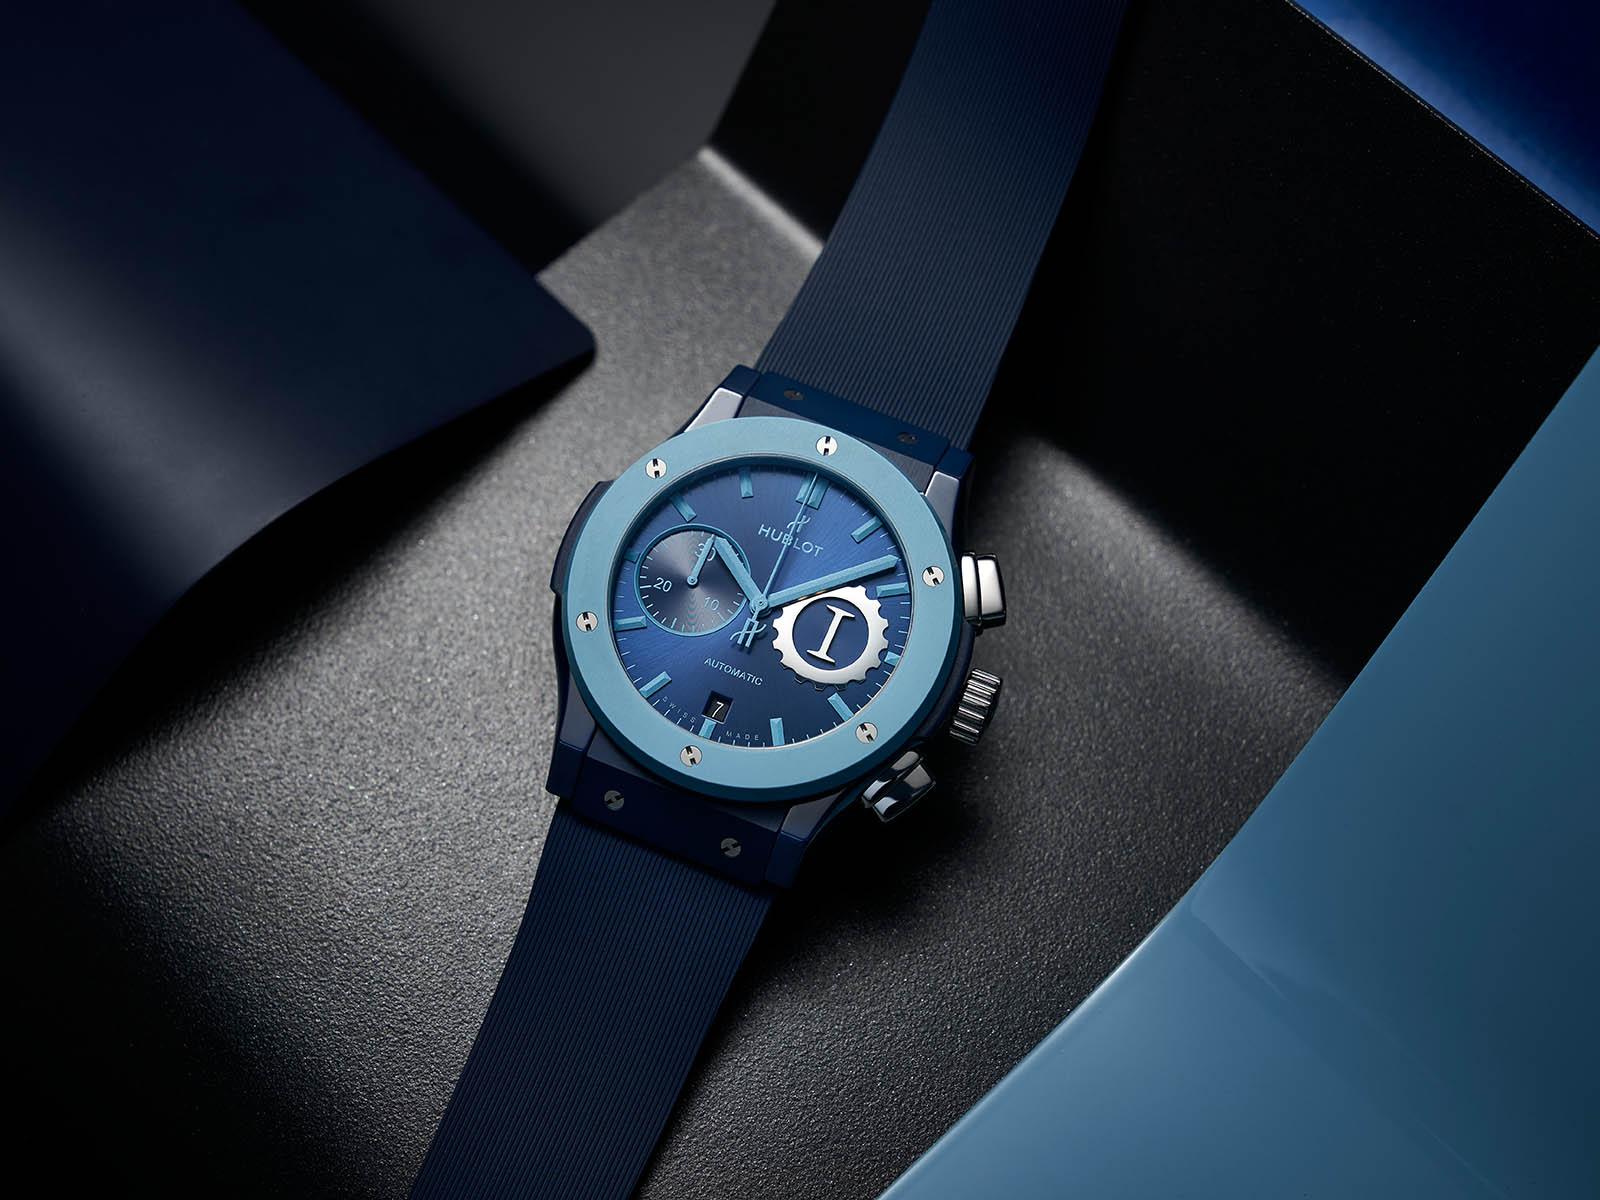 hublot-classic-fusion-chronograph-garage-italia-521-ex-7170-rx-git19-2.jpg